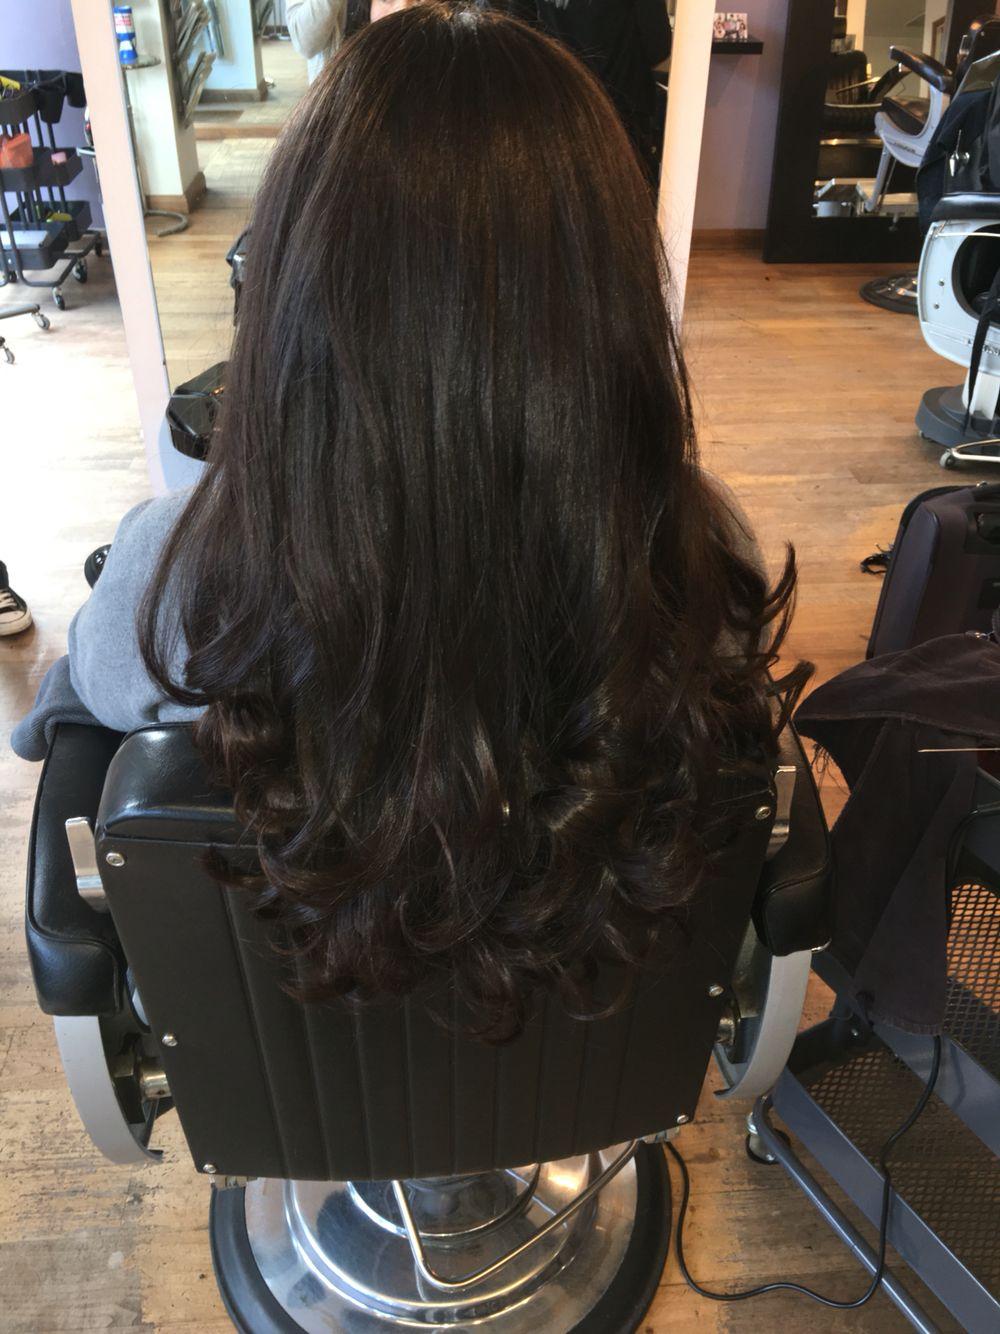 Brunette Bouncy Volume Curly Blowdry Long Layered Hair Hair Styles Hair